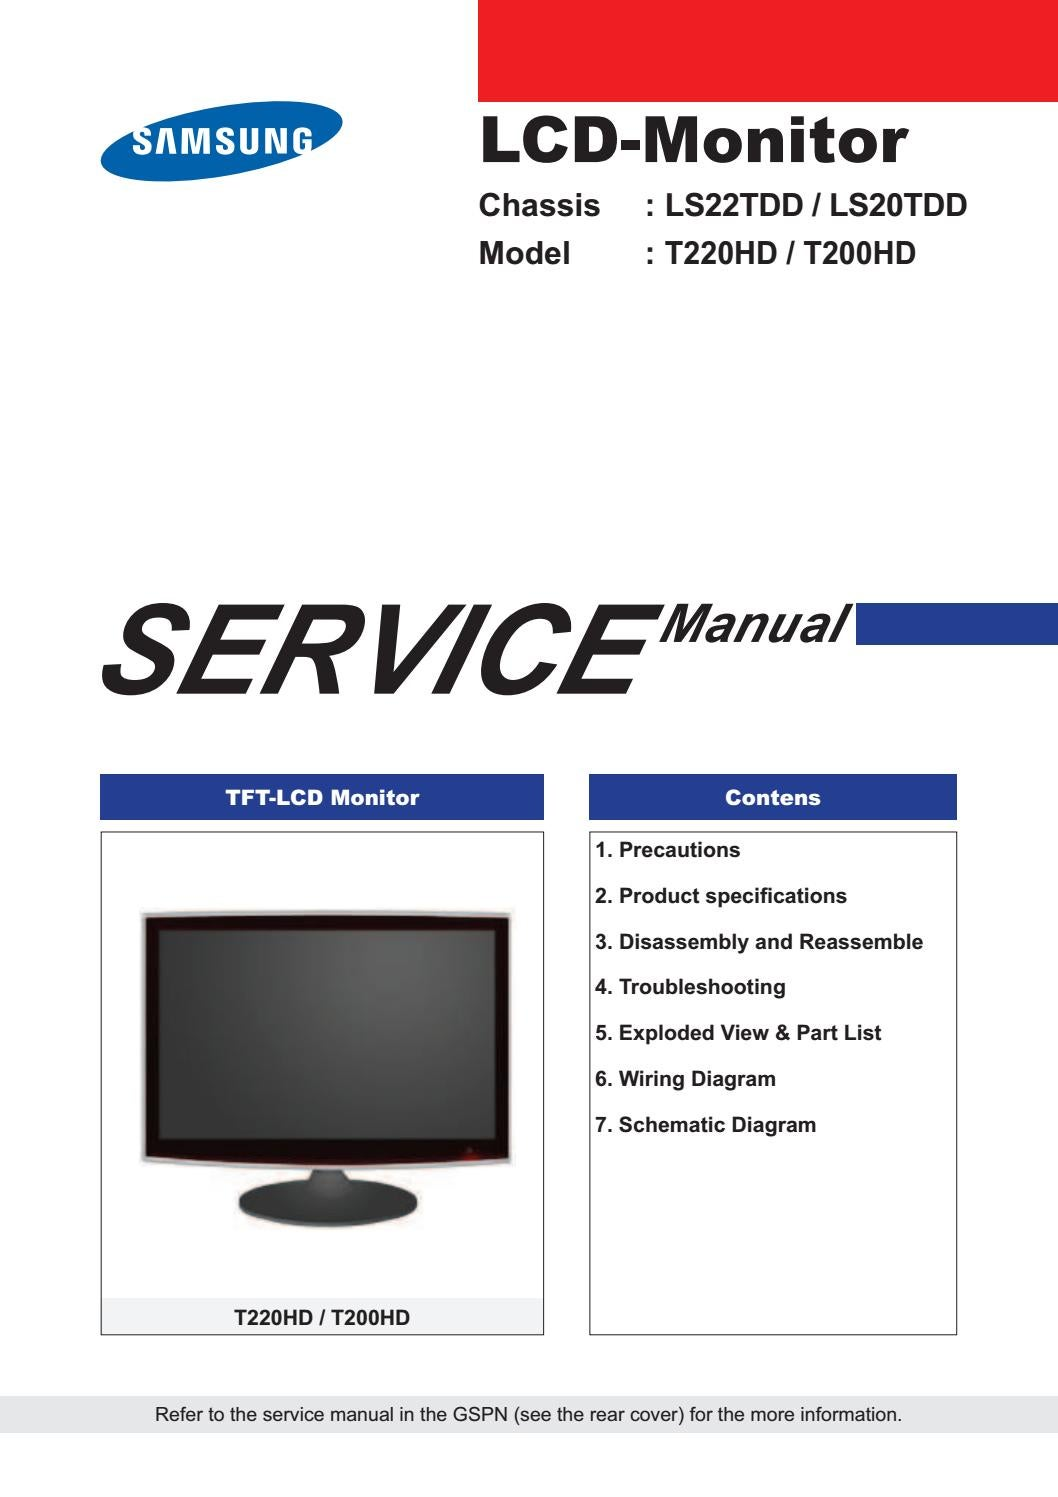 Manual De Servi U00e7o Dos Monitores Samsung Modelos T200hd E T220hd Com Os Chassises Ls20tdd E